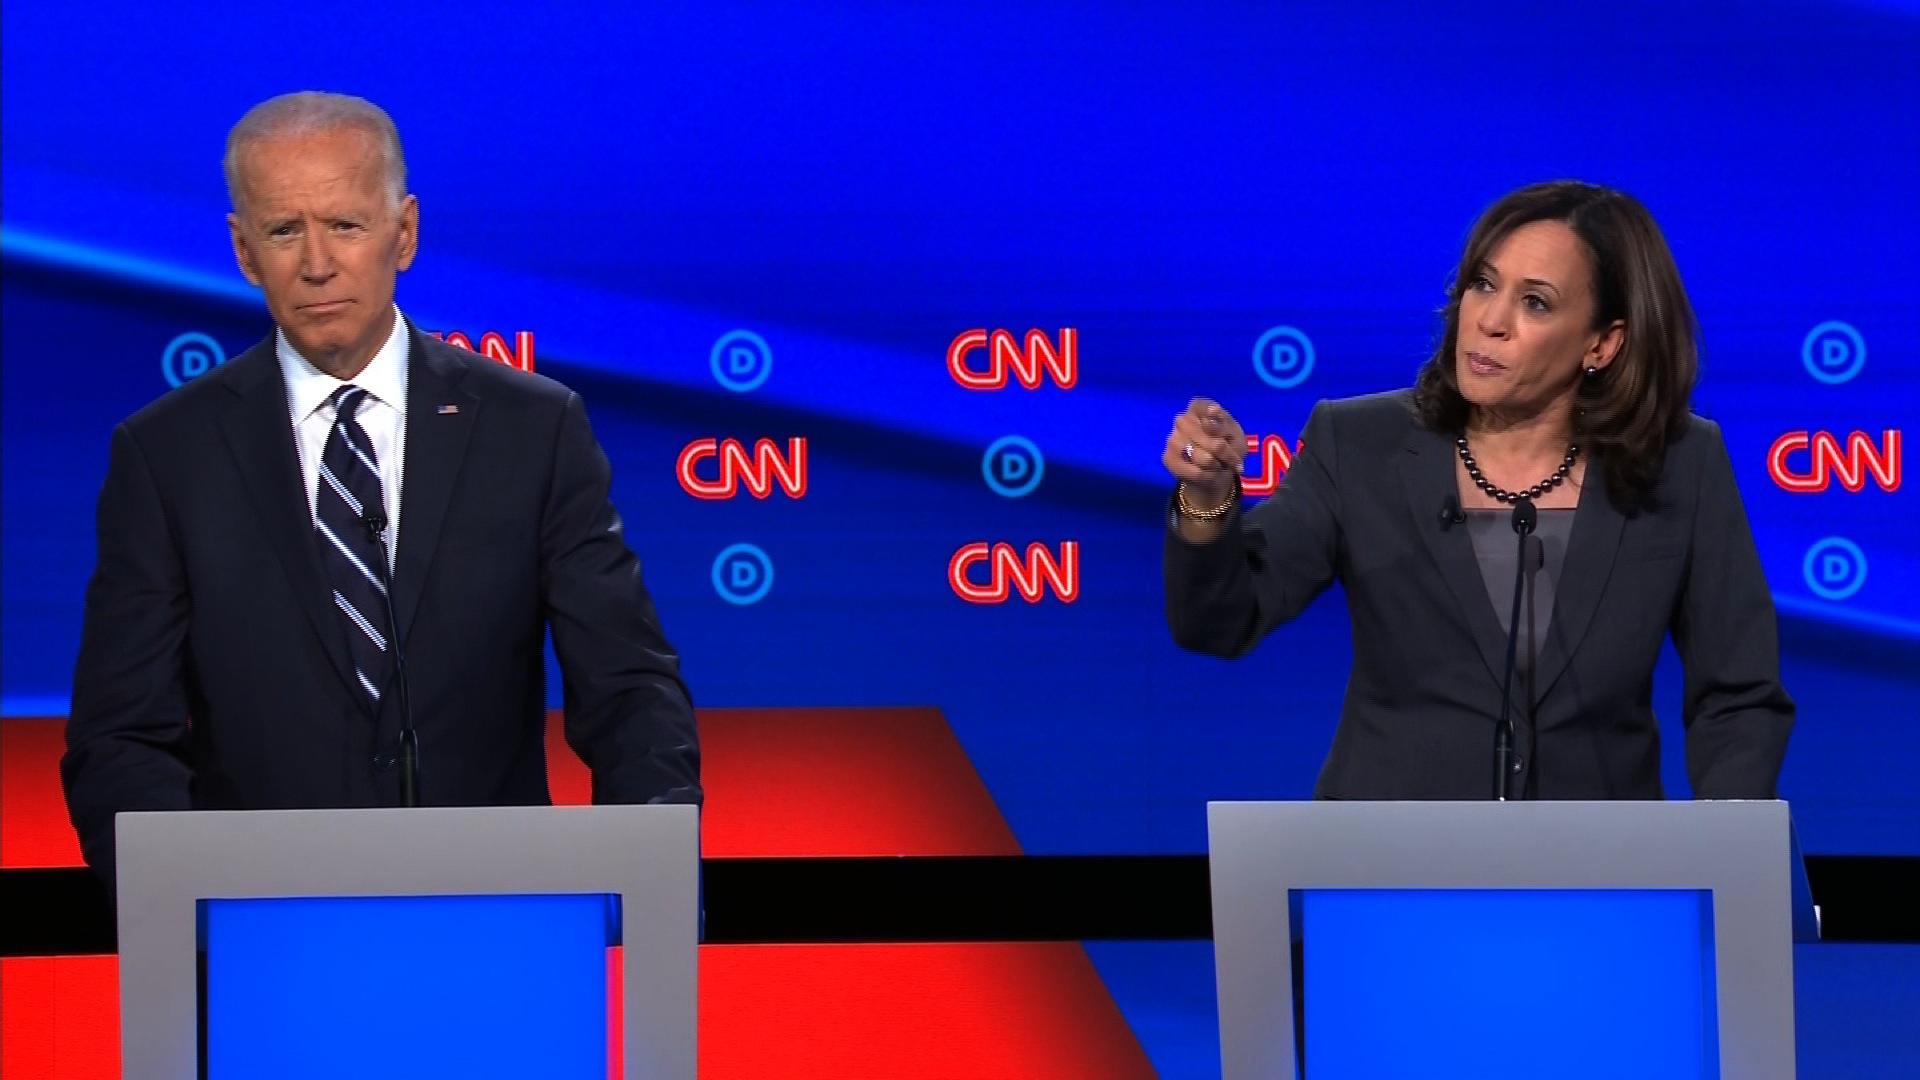 Joe Biden and Kamala Harris reignite battle over busing - CNN Video